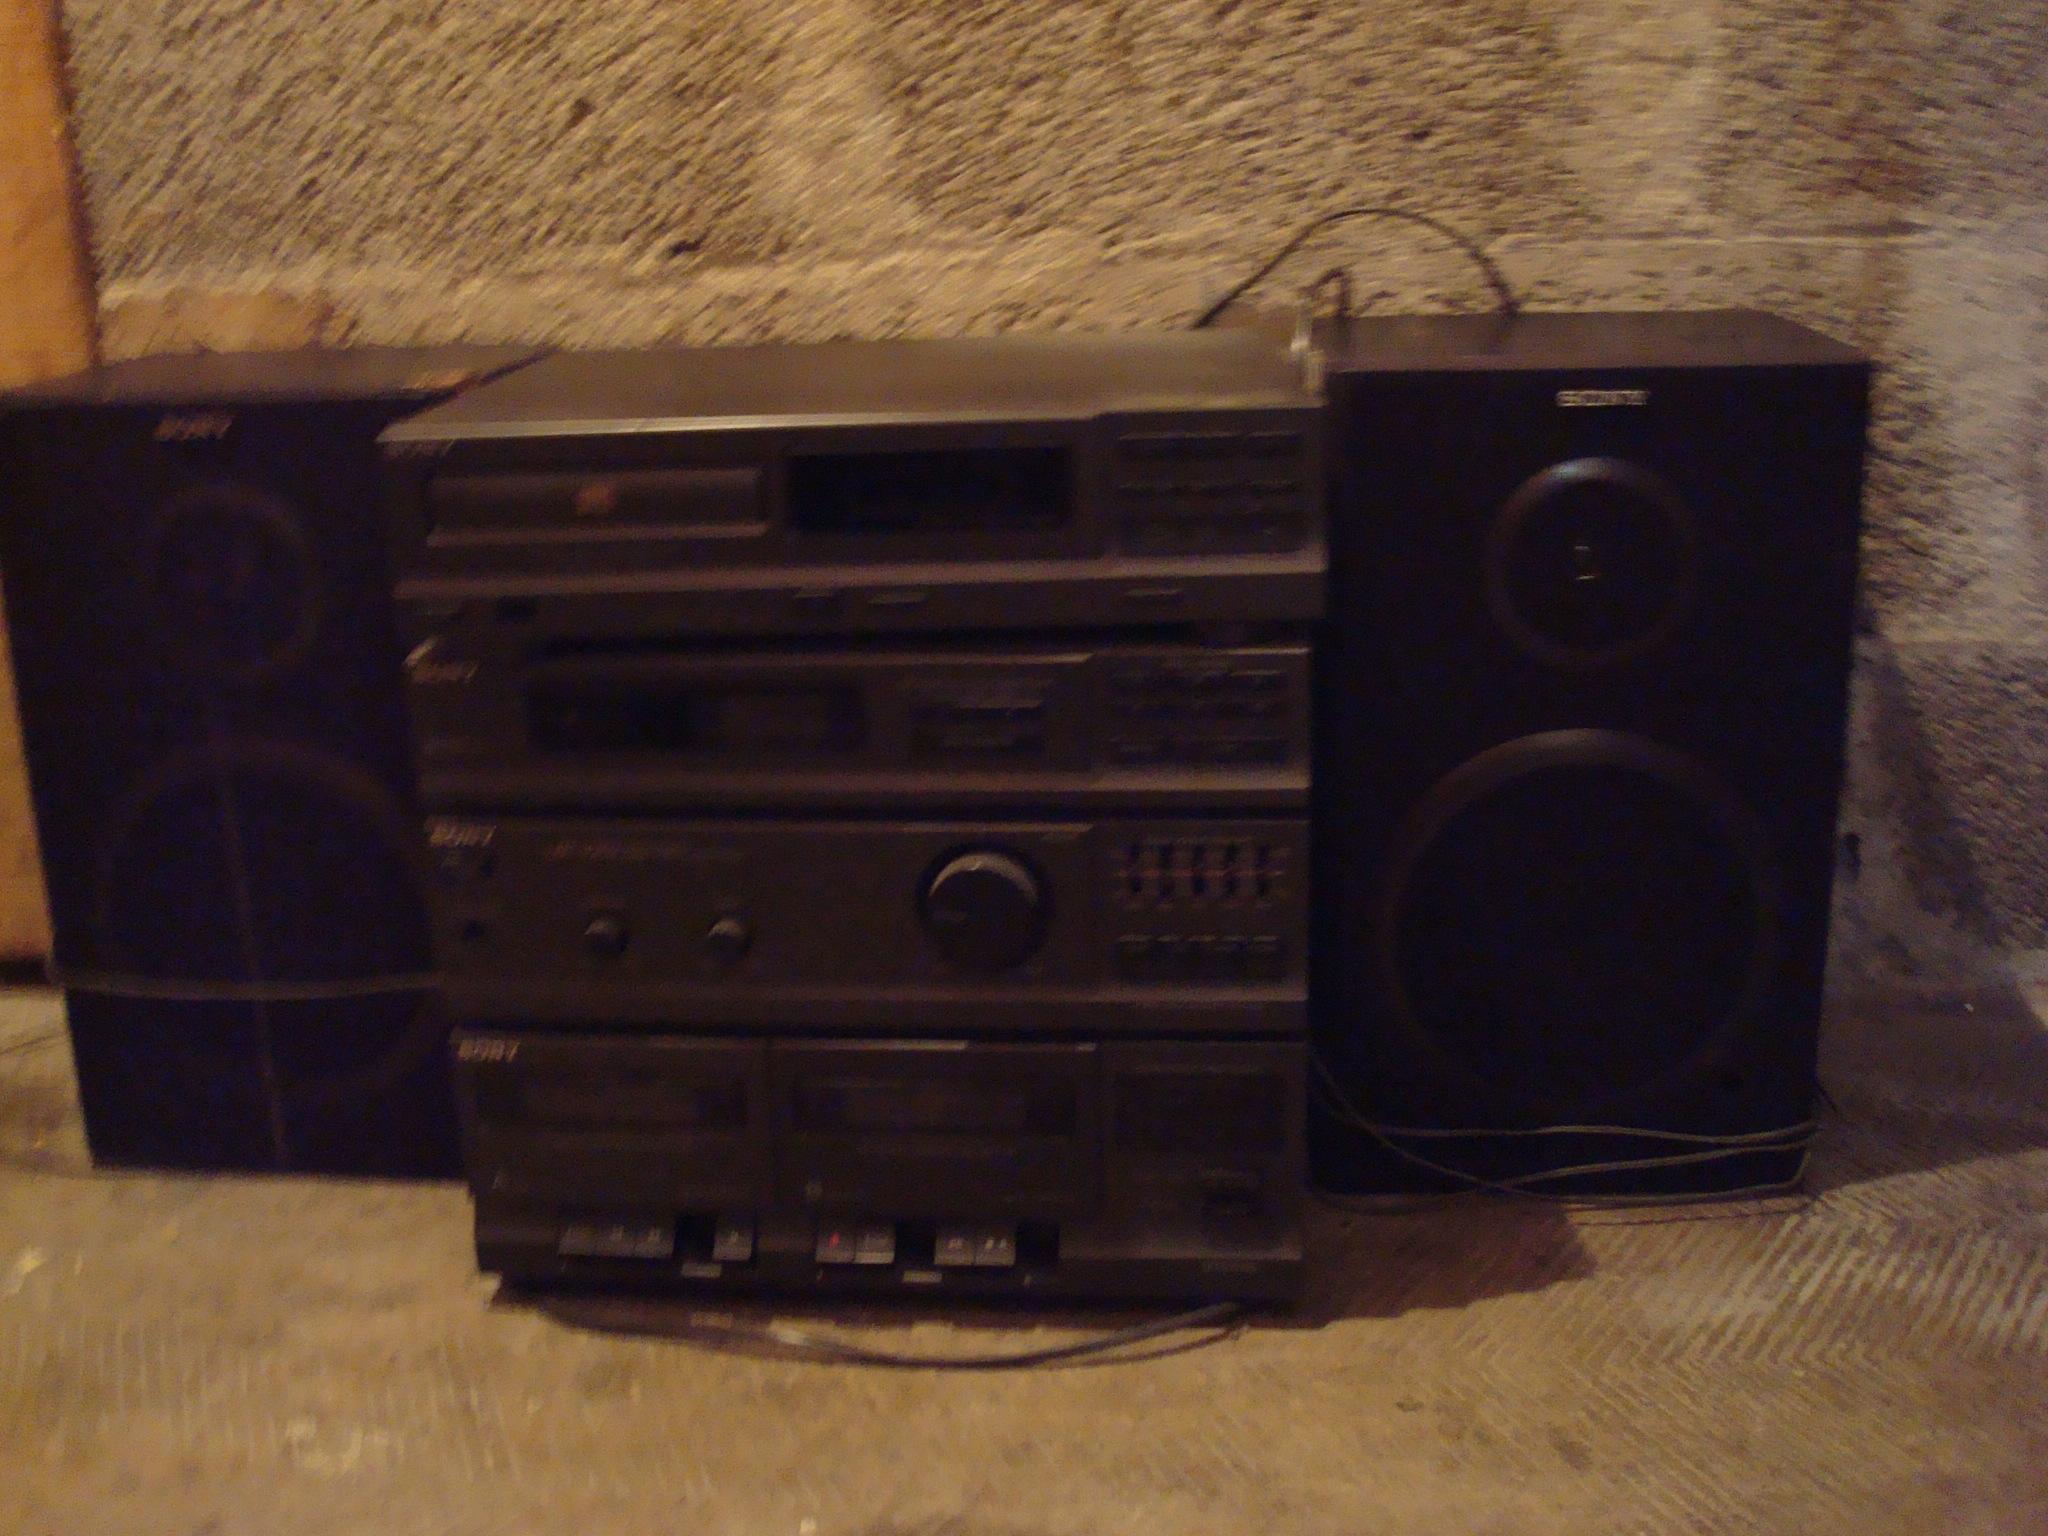 Vends chaine stereo SONY Audio et hifi